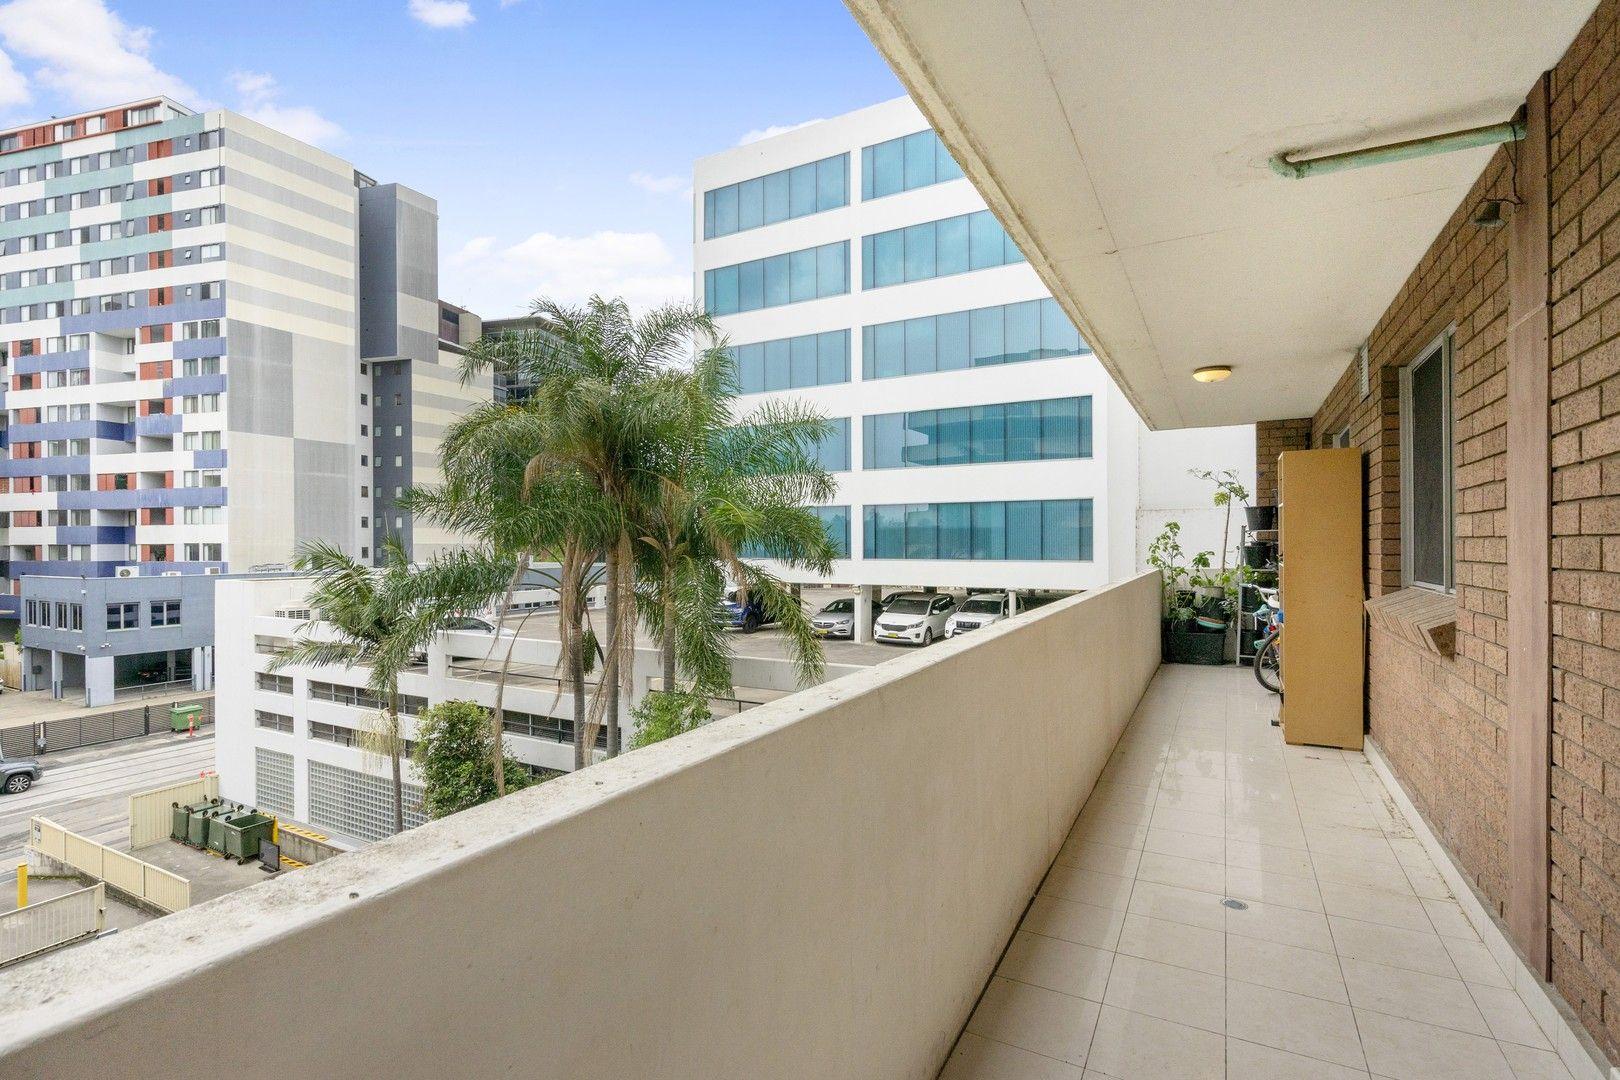 20/5-15 Union Street, Parramatta NSW 2150, Image 0